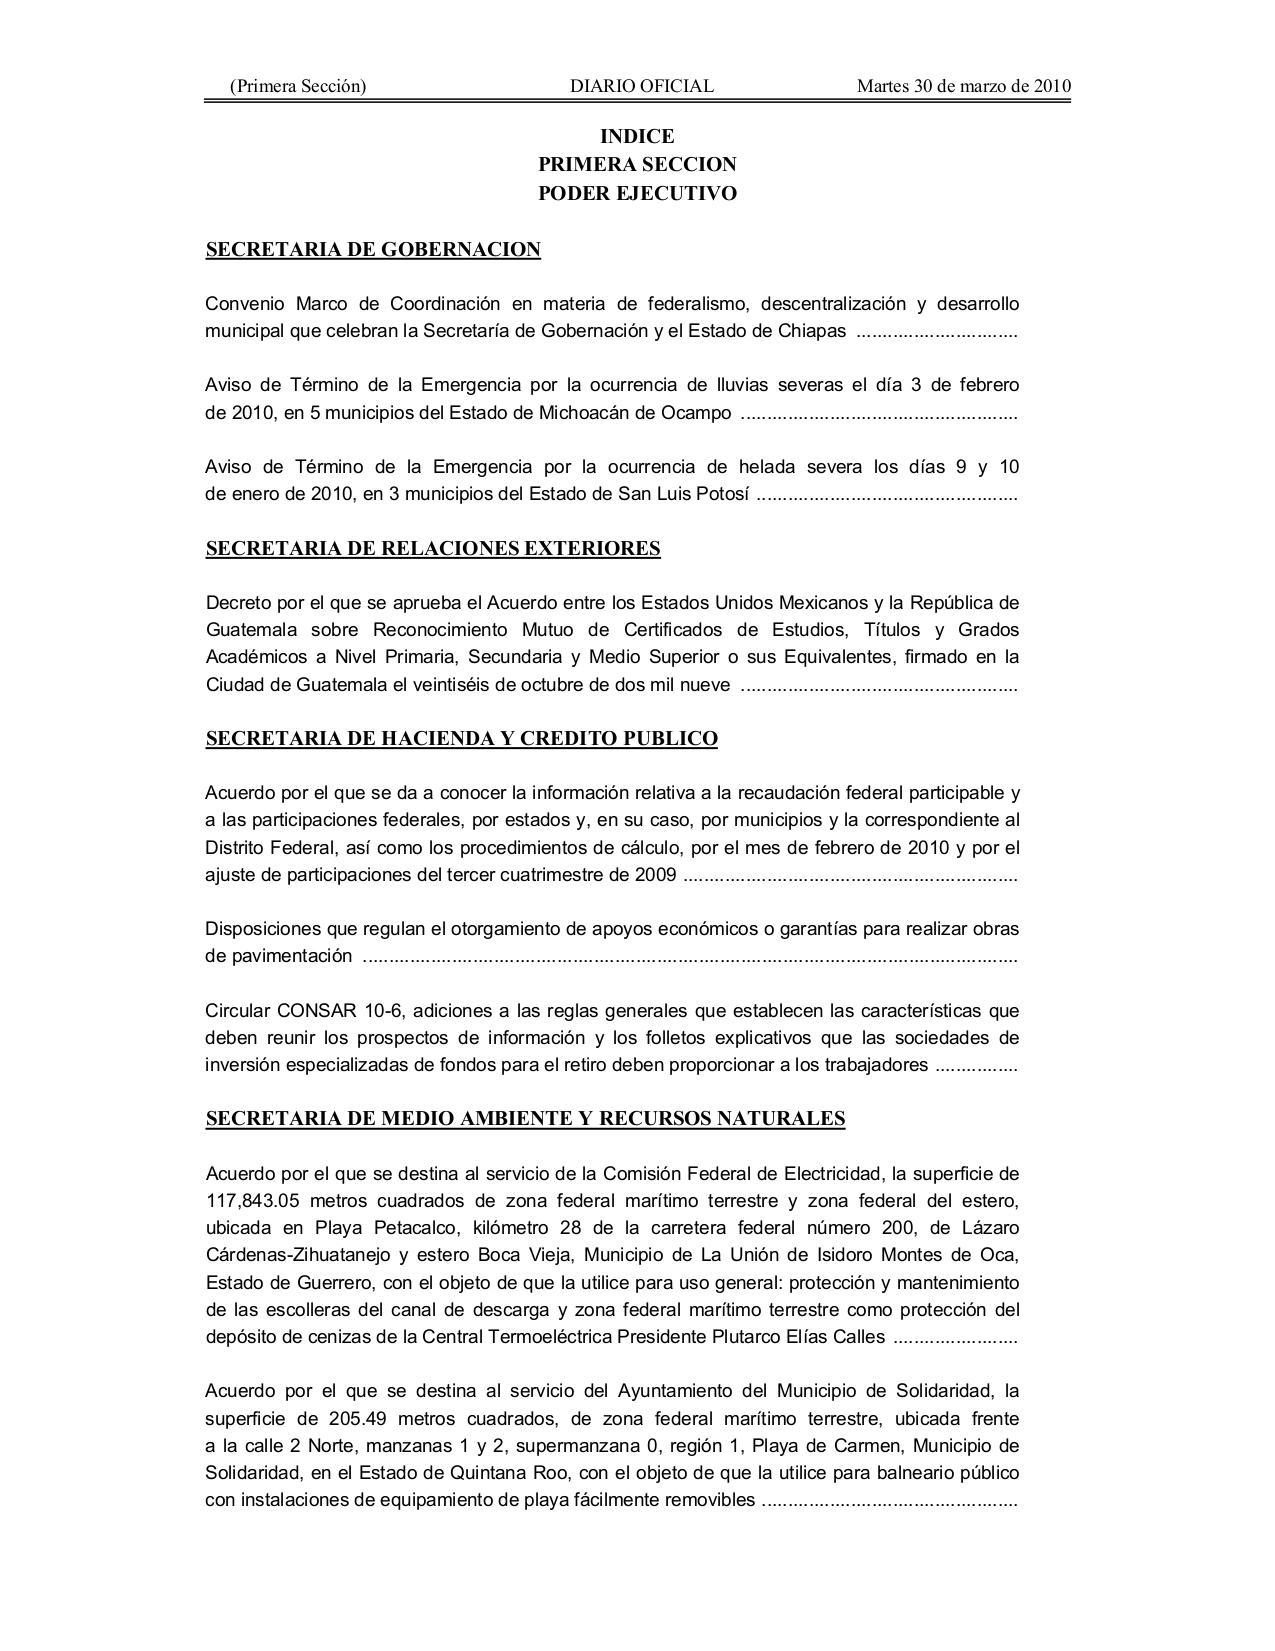 Download free pdf for Sony BRAVIA KDL-22L4000 TV manual